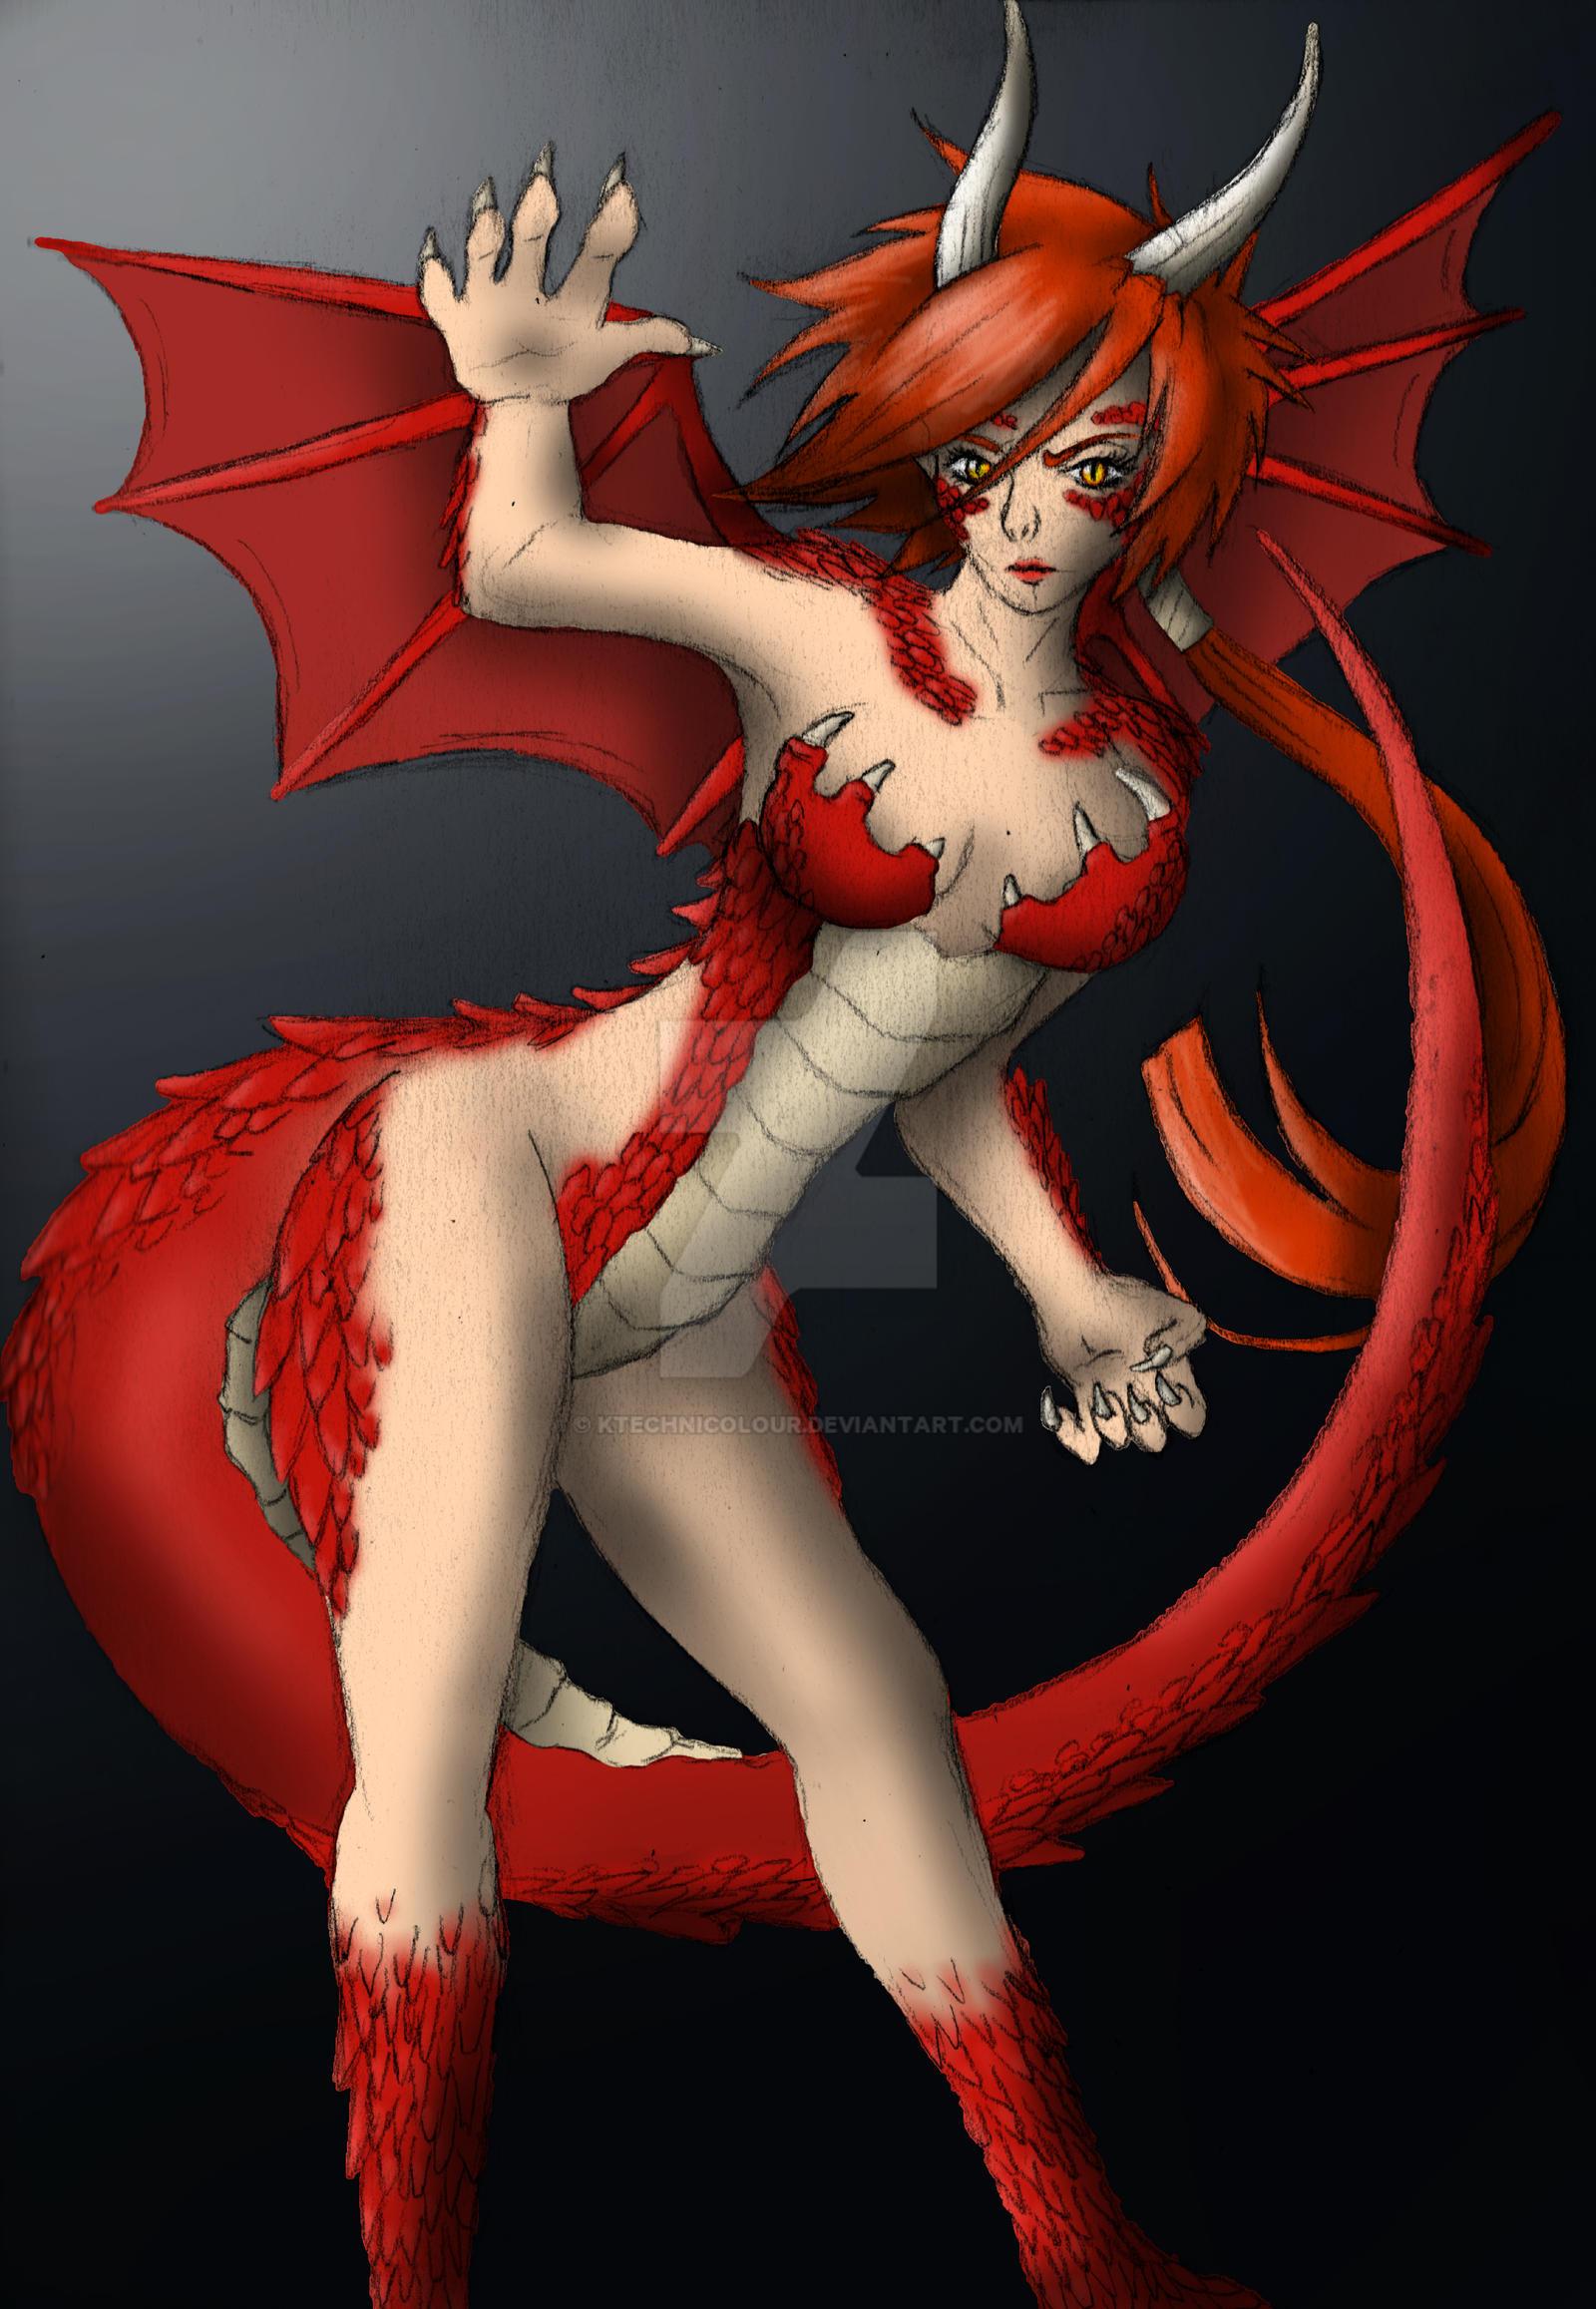 Dragon Girl by KTechnicolour